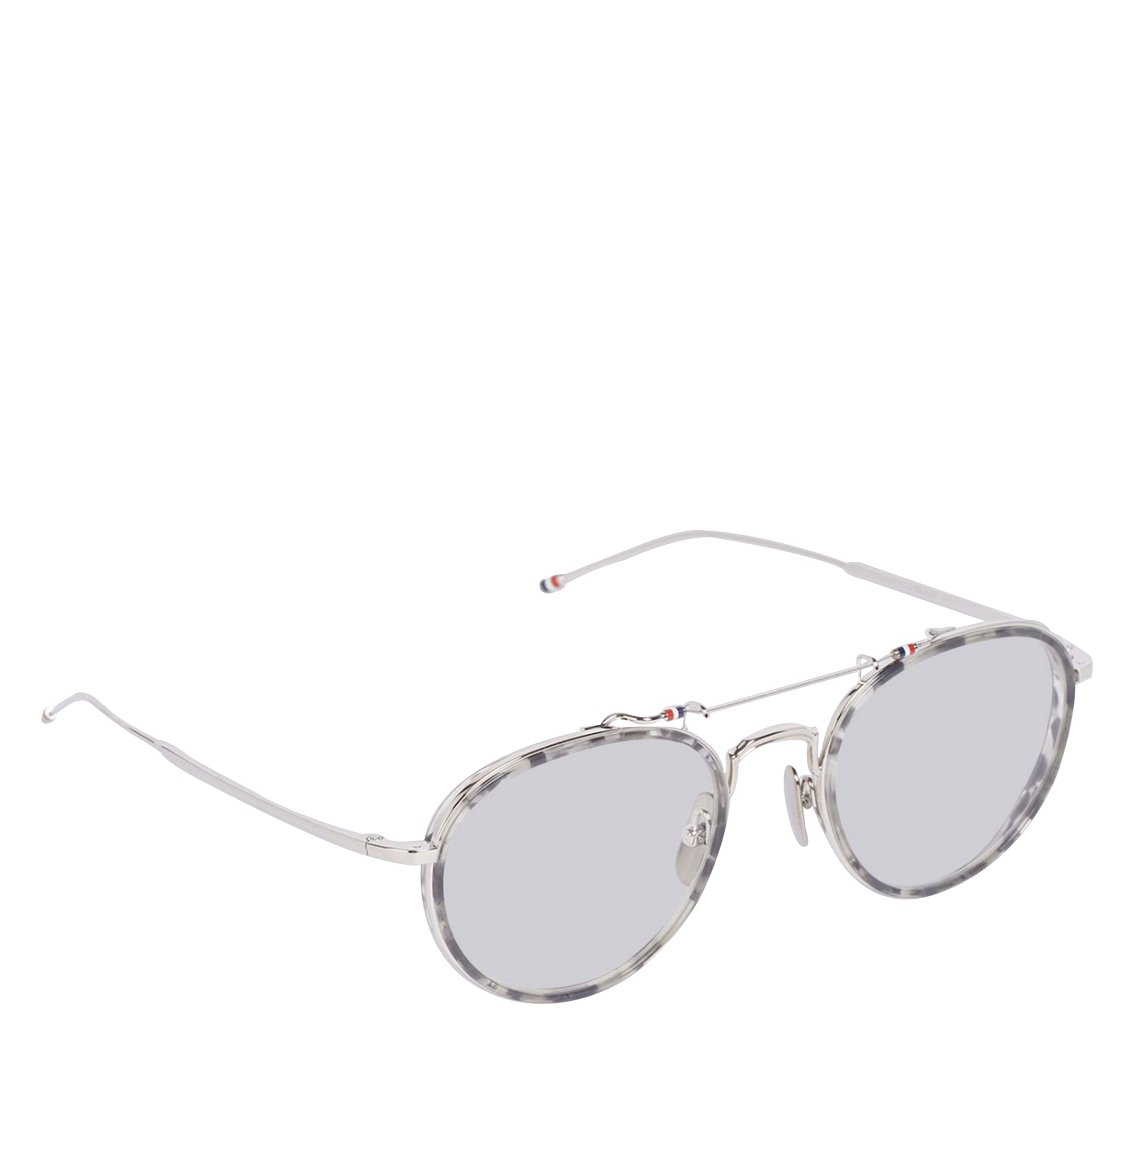 Thom Browne Grey Tortoiseshell Oval Sunglasses Γυαλιά Ηλίου